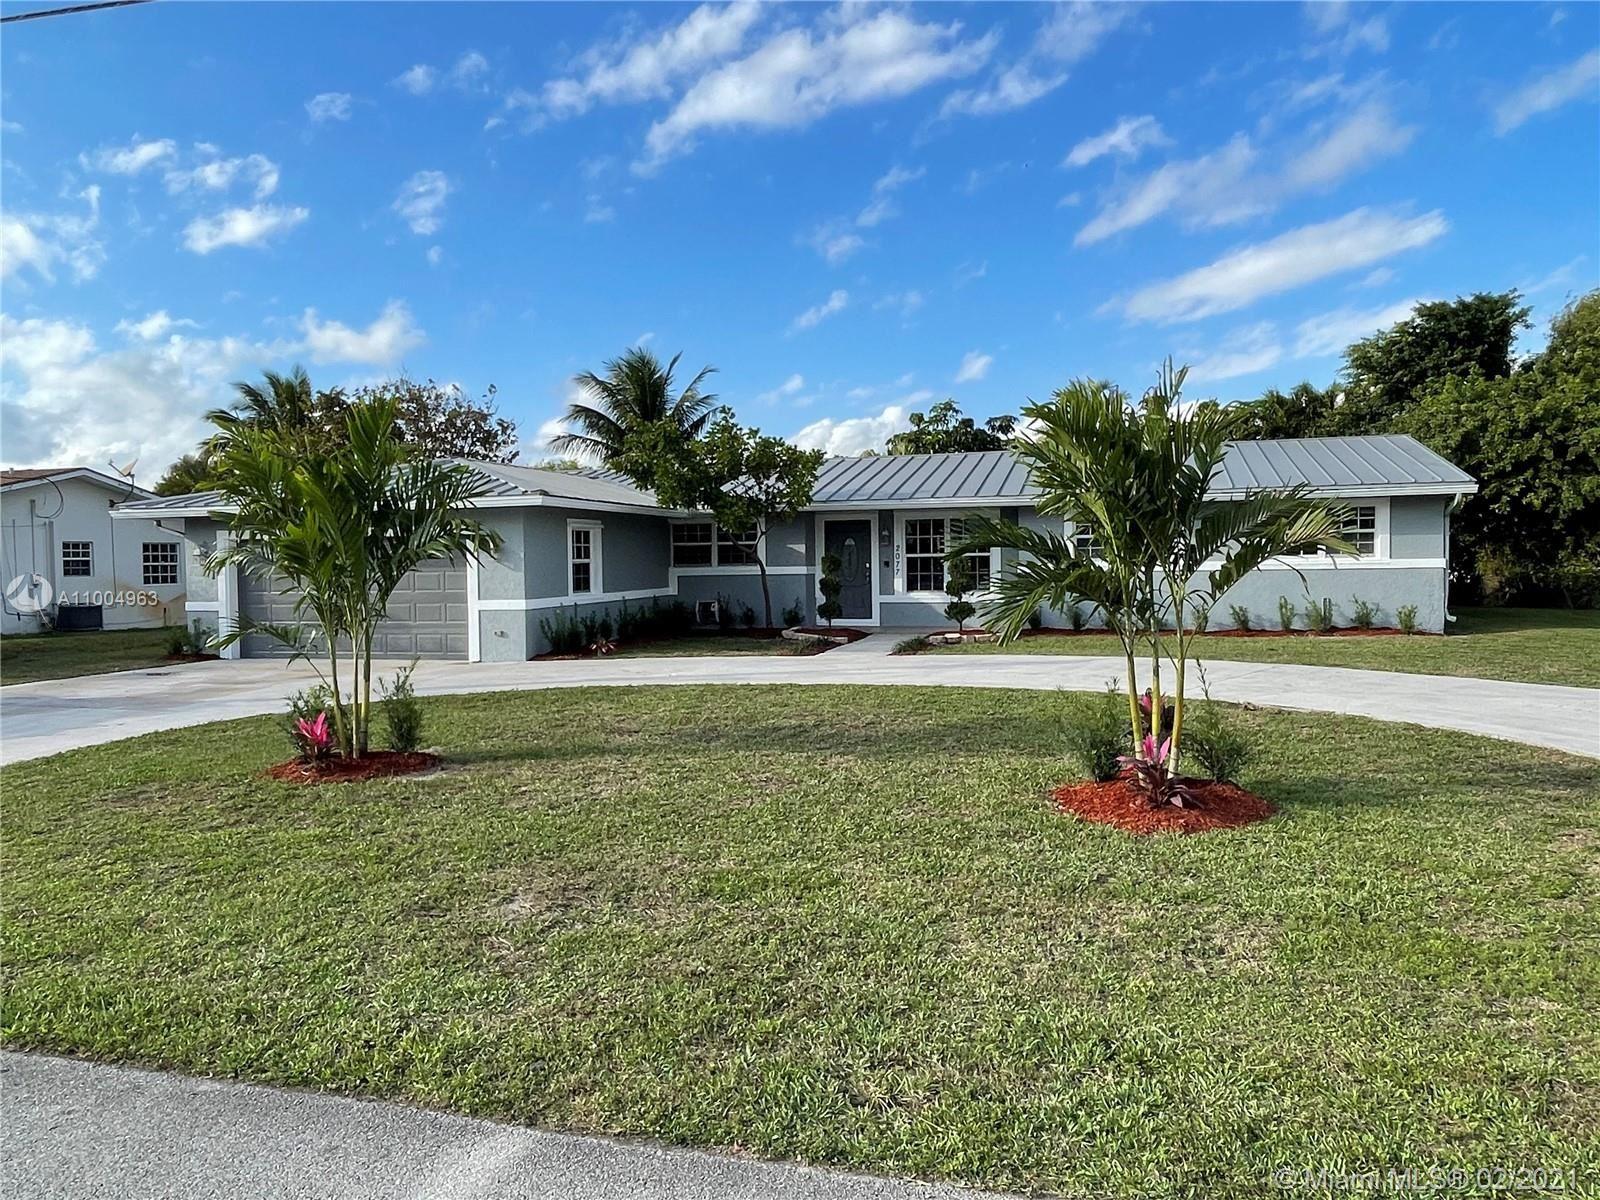 2077 Carambola Rd, West Palm Beach, FL 33406 - #: A11004963